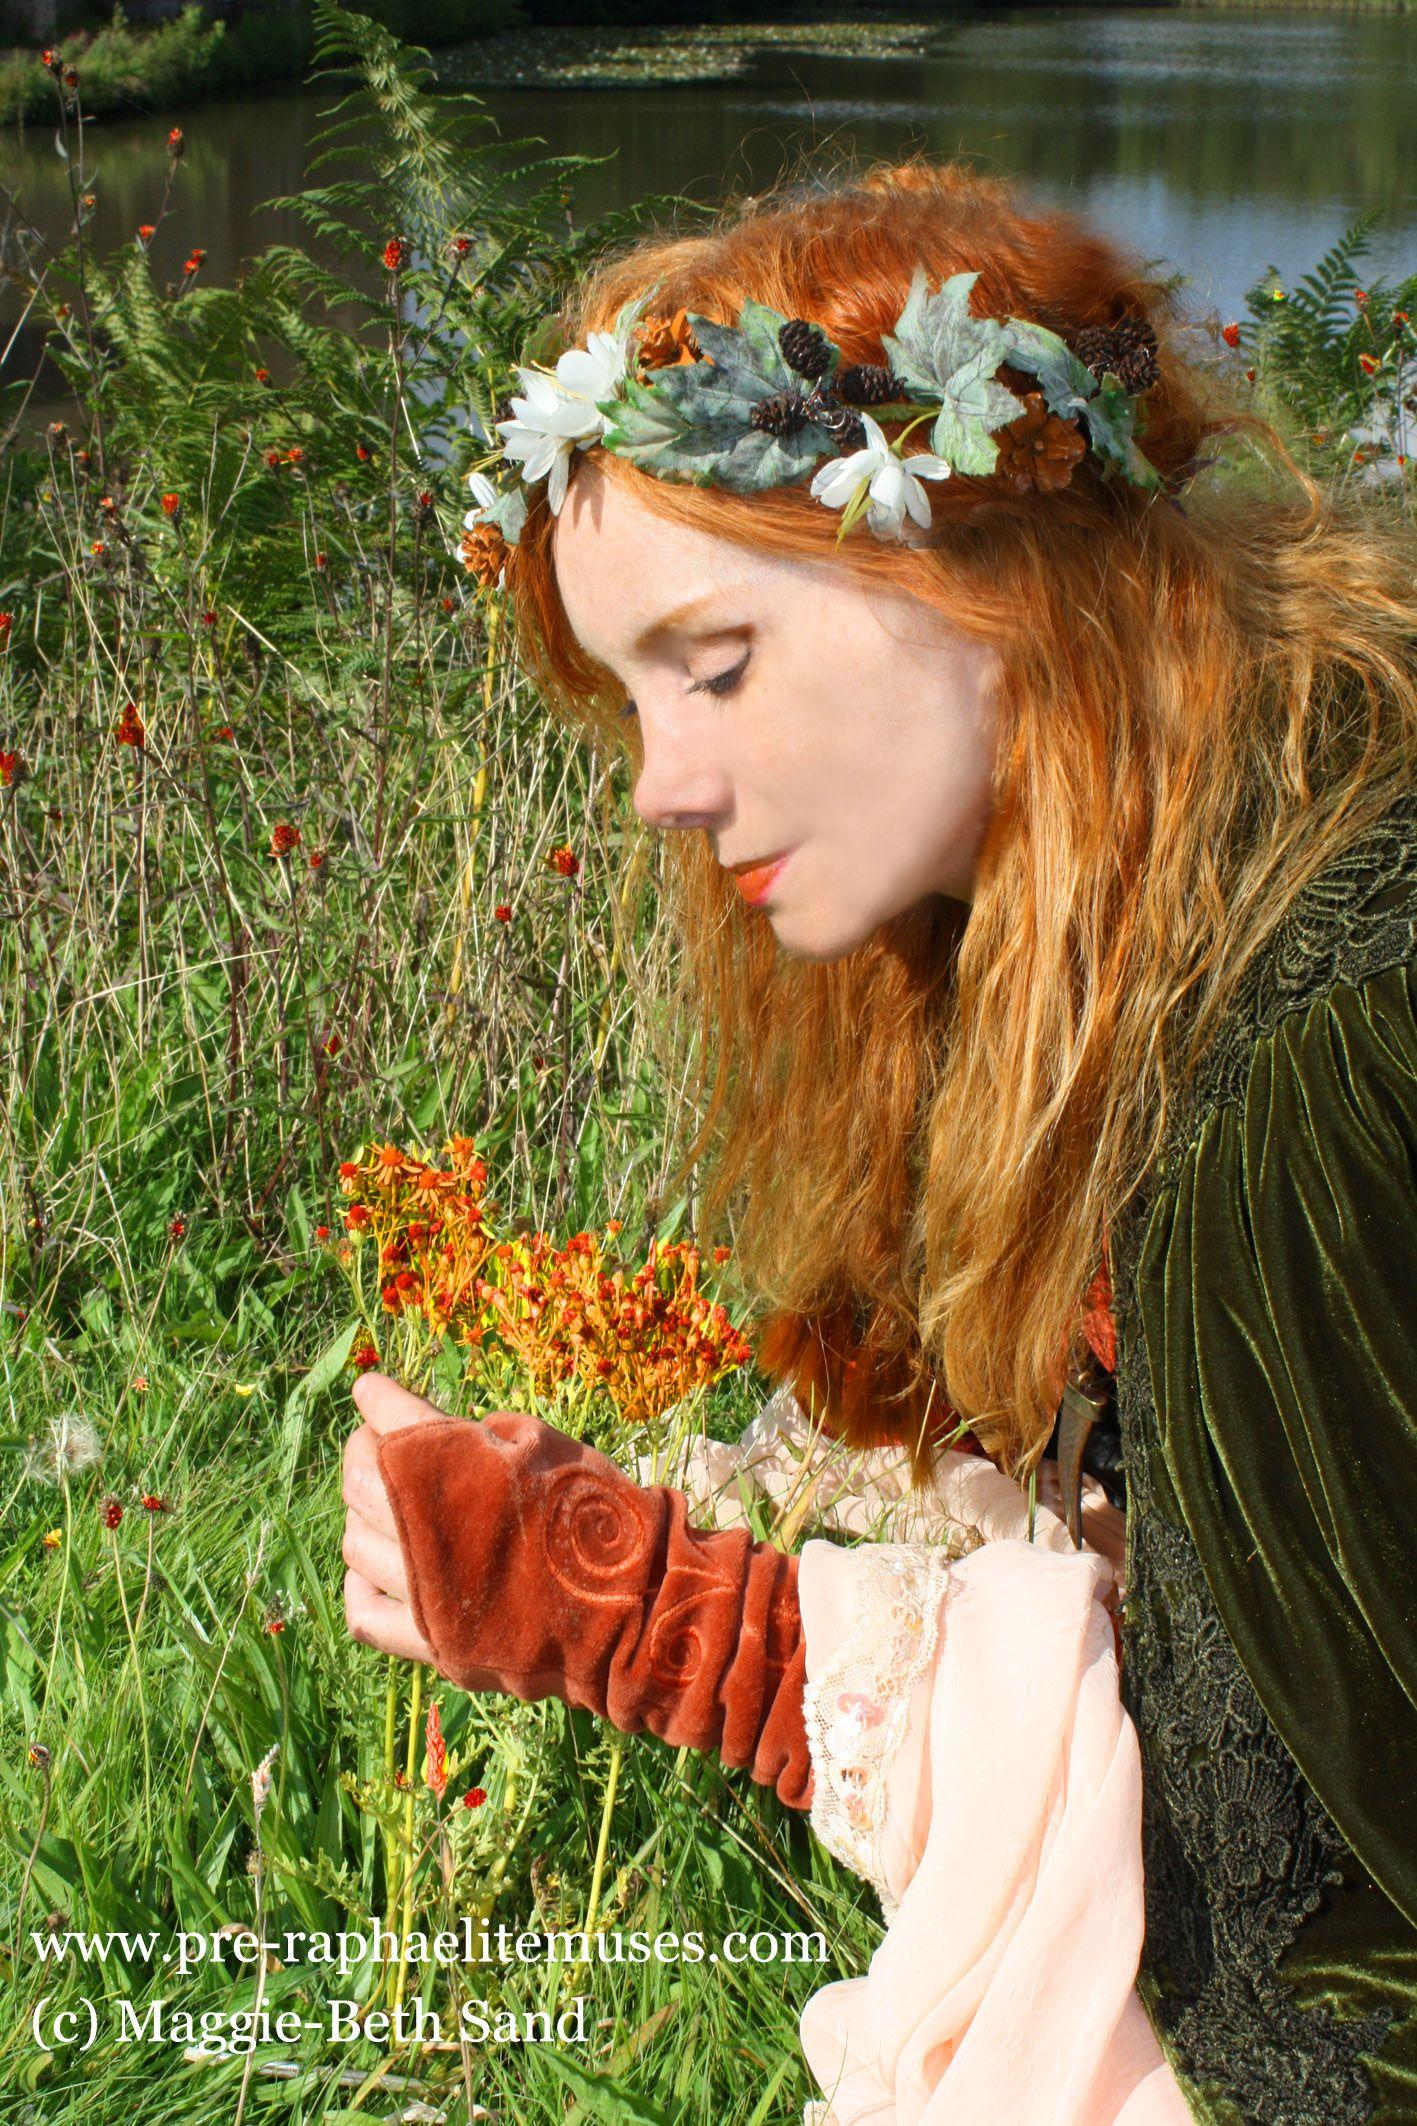 Maggie-Beth Sand | Pre-Raphaelite Muses